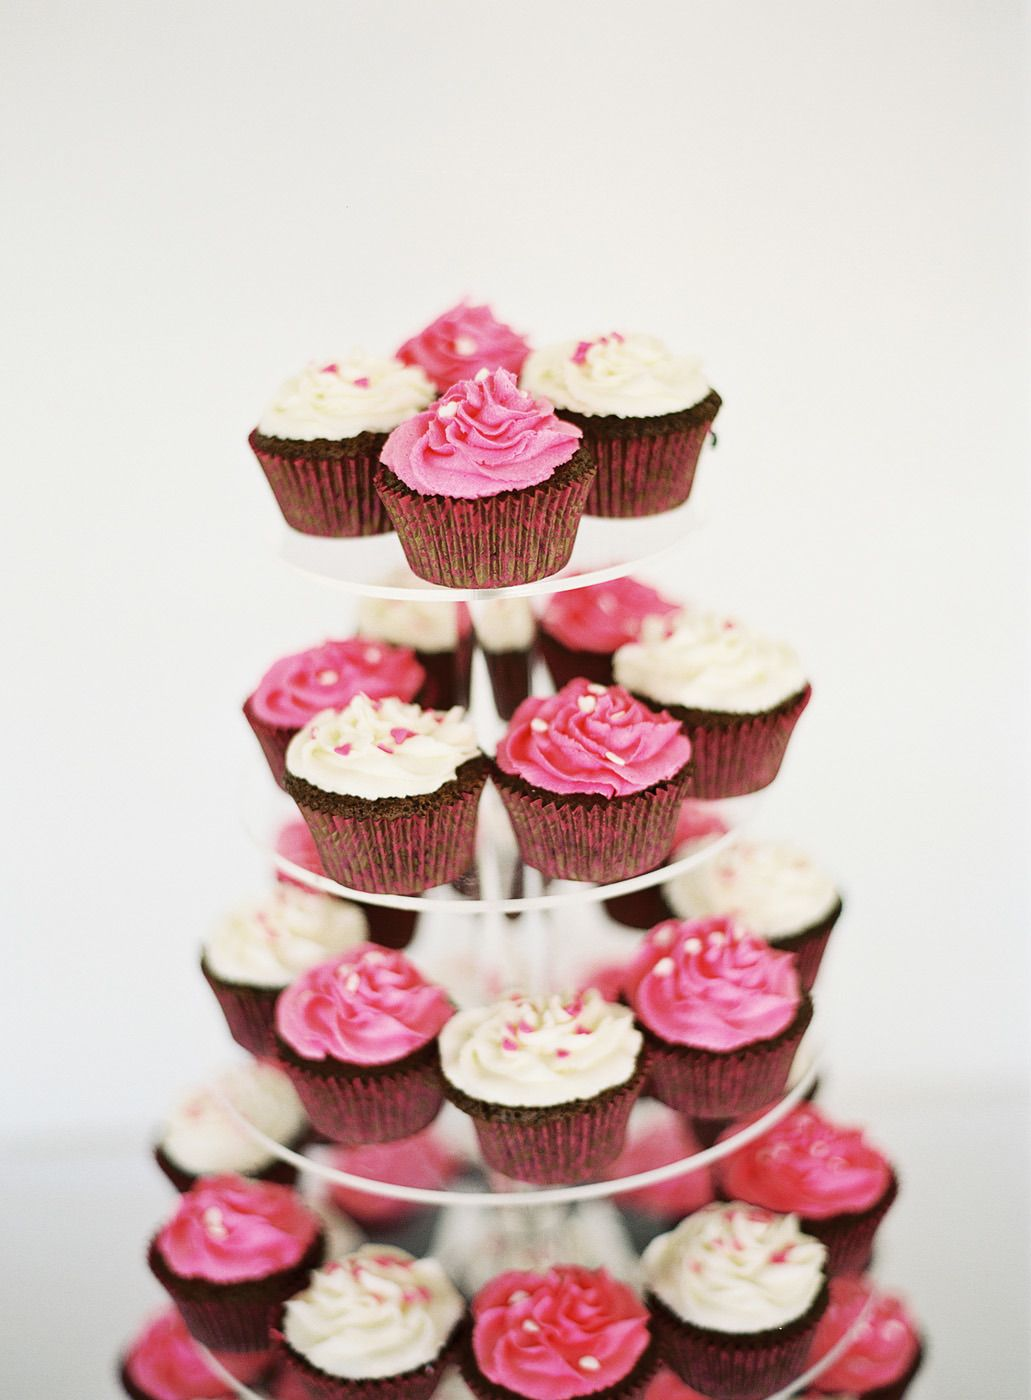 Morning Star Estate Wedding | Morning star, Cake and Food